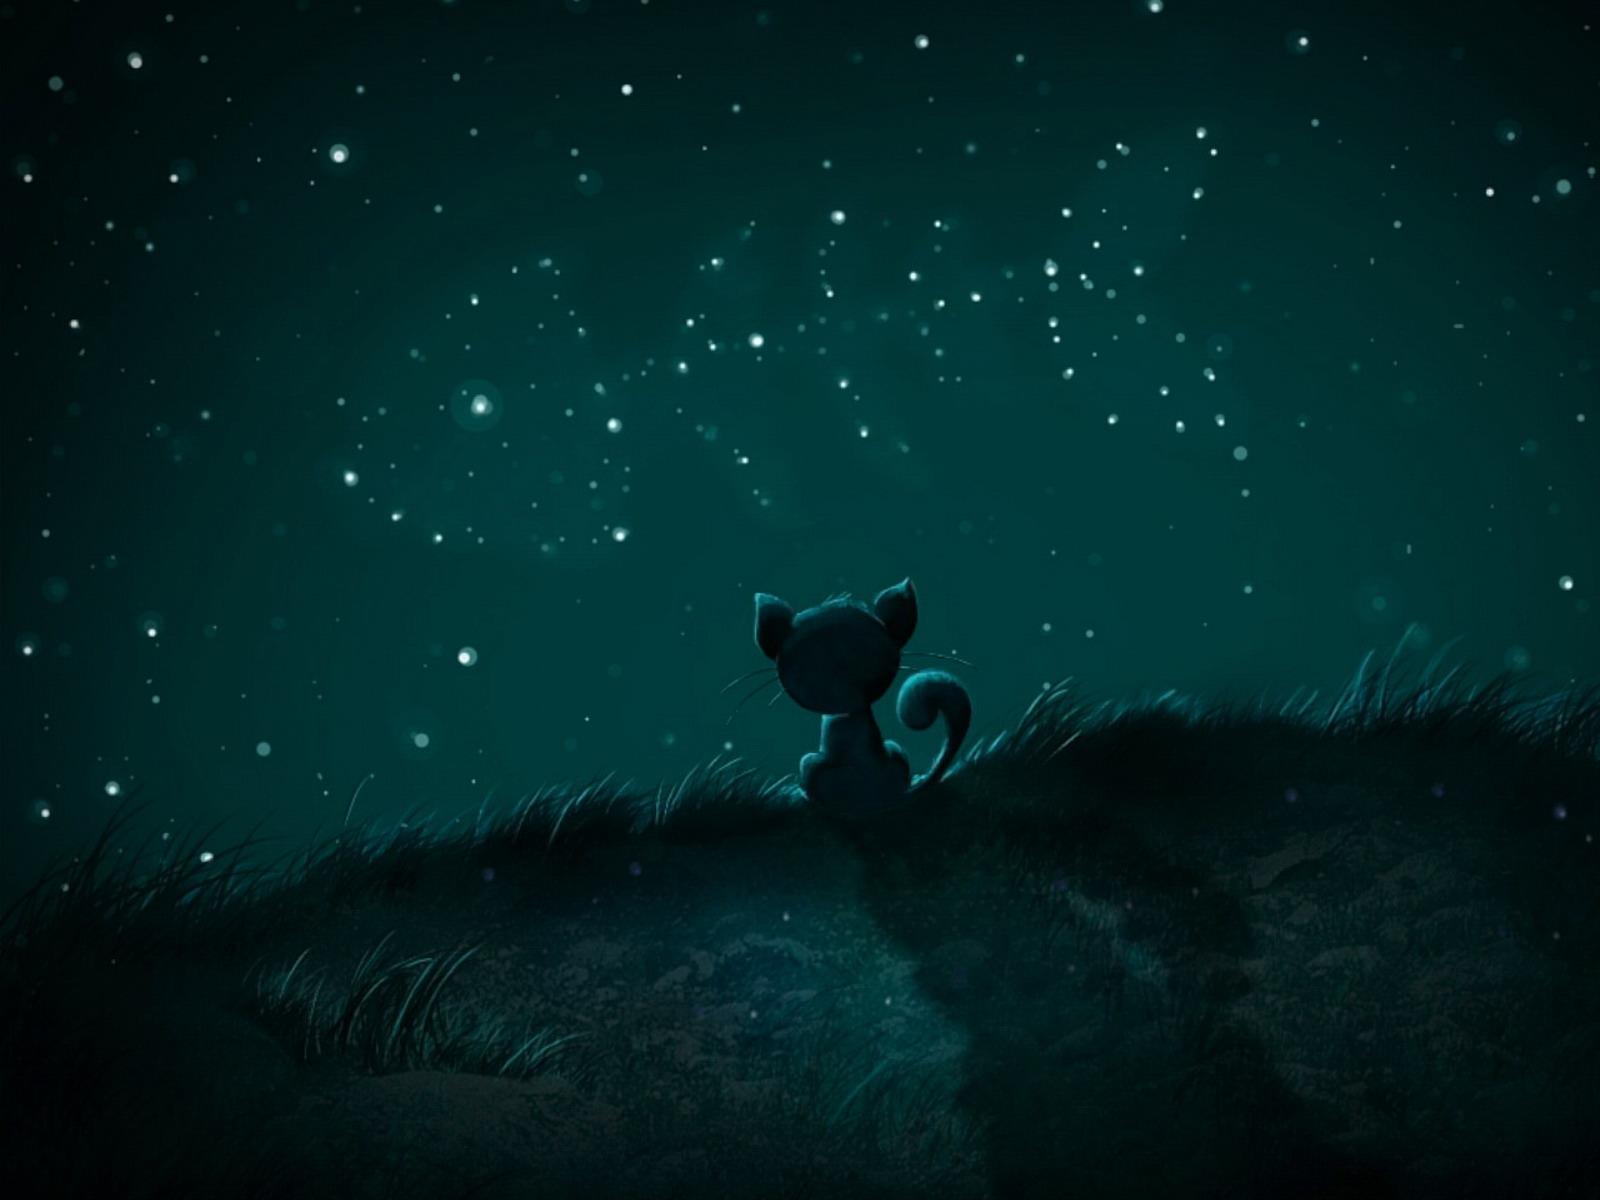 Stars Night Wallpaper Desktop HD Download Dream Wallpapers 1600x1200